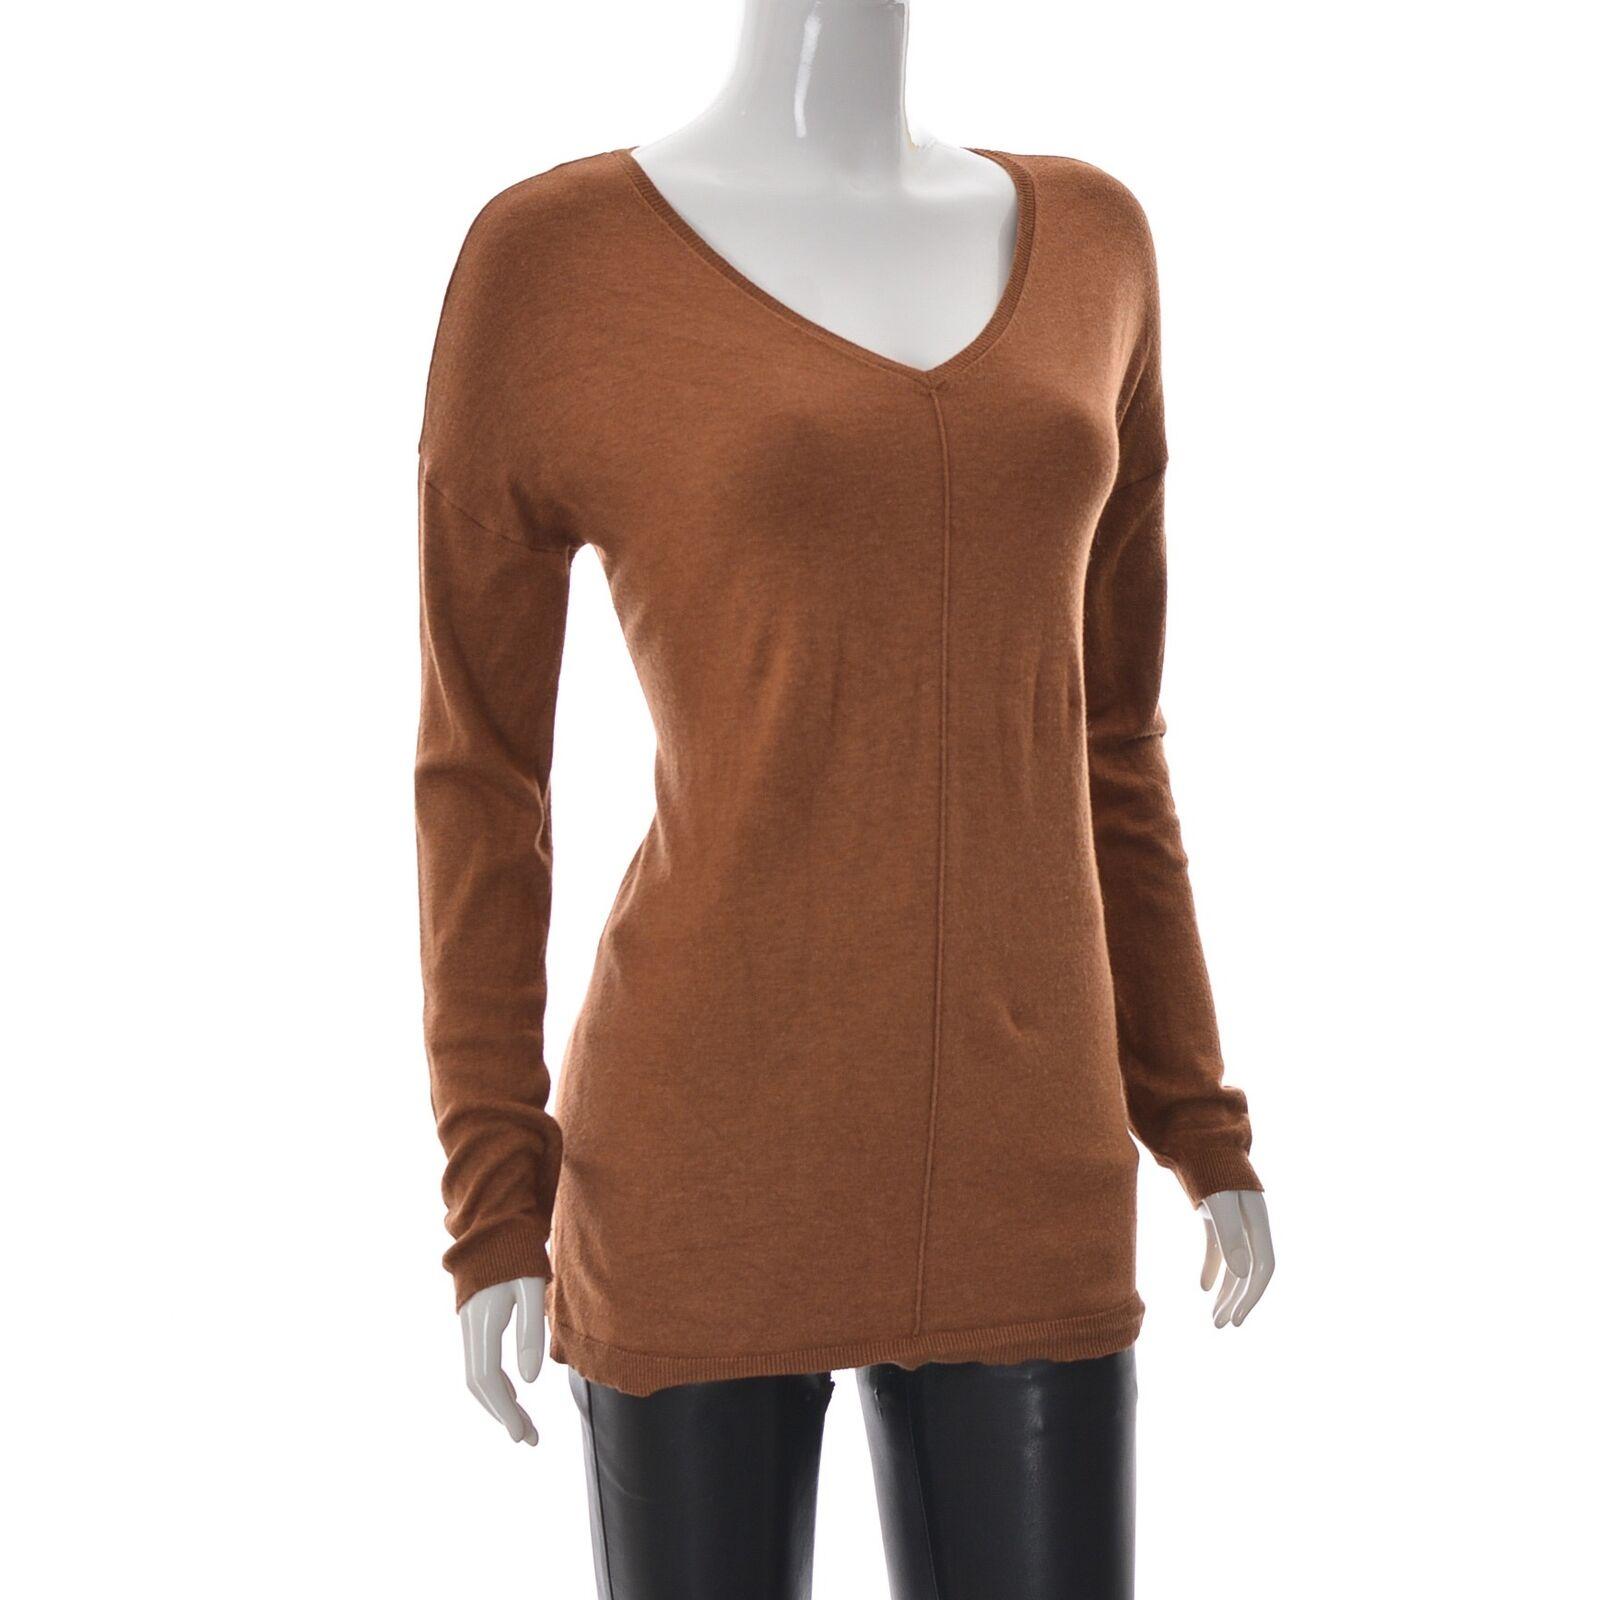 Atmosphere Damen V-Ausschnitt Pullover Tunika Top Hemd Langärmelig Größe EUR-38